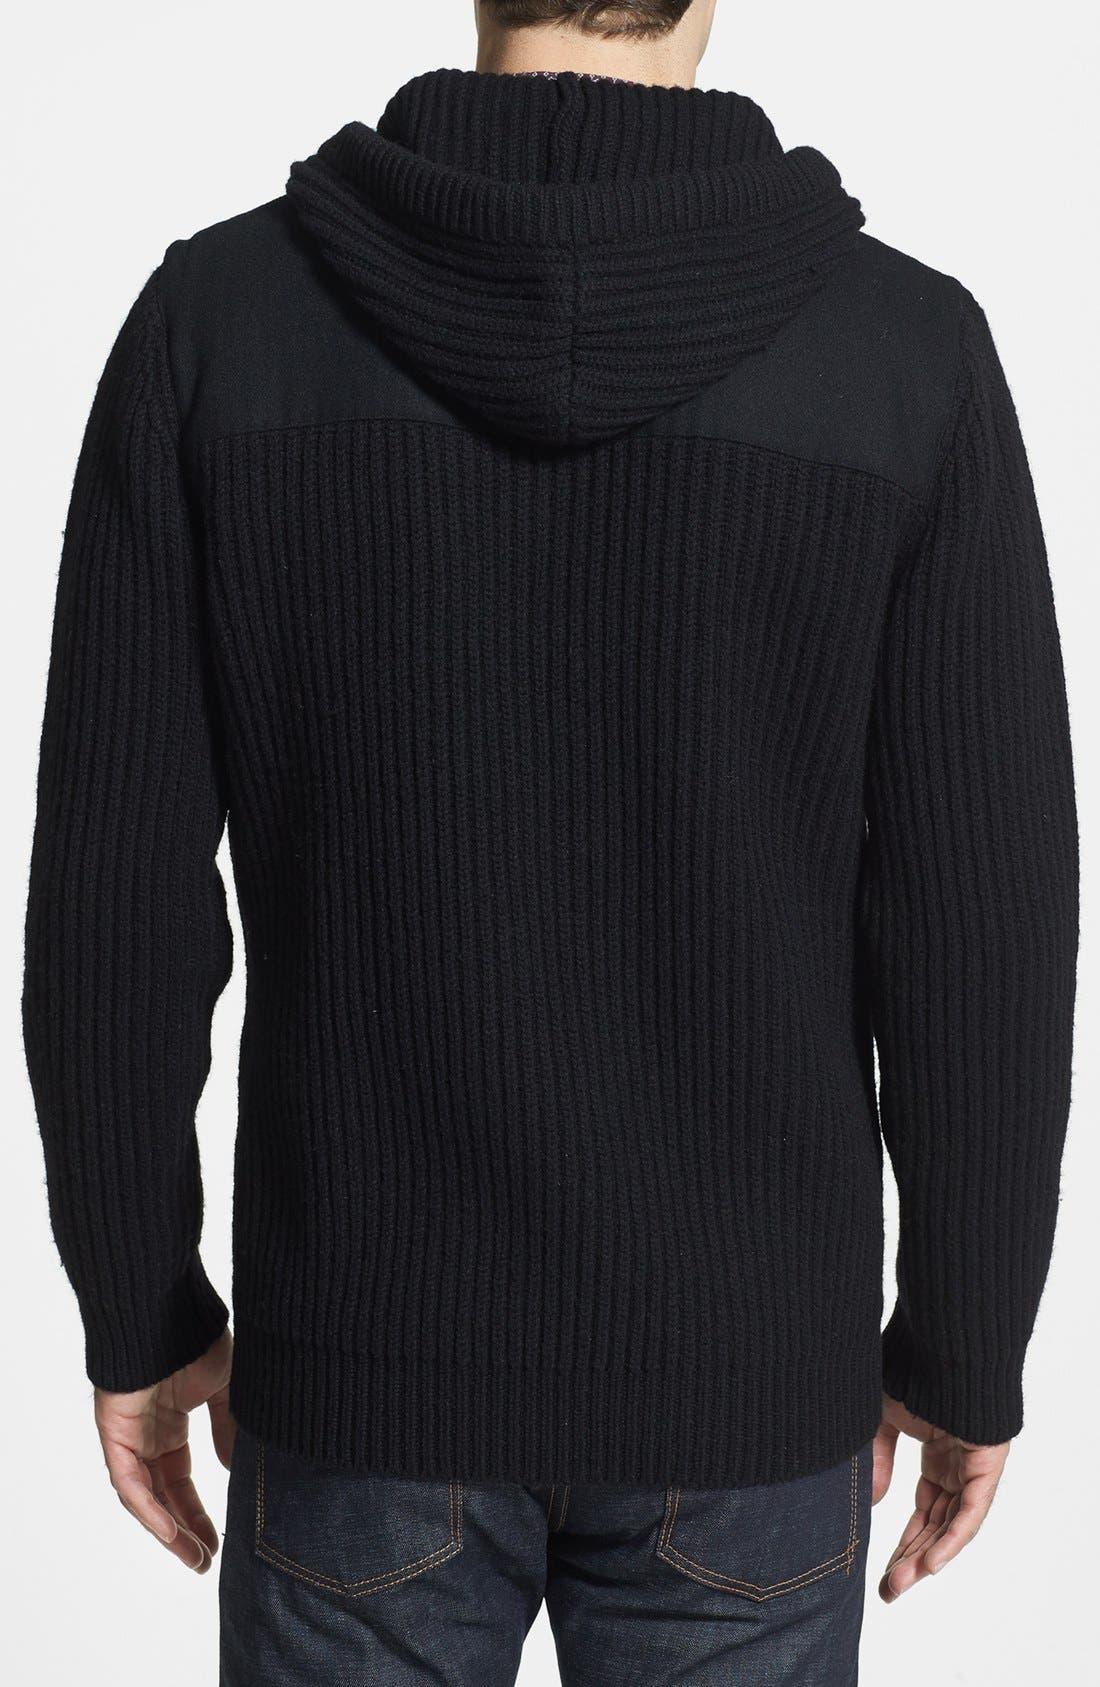 Alternate Image 2  - French Connection 'Myrrh Patch Melton' Sweater Jacket